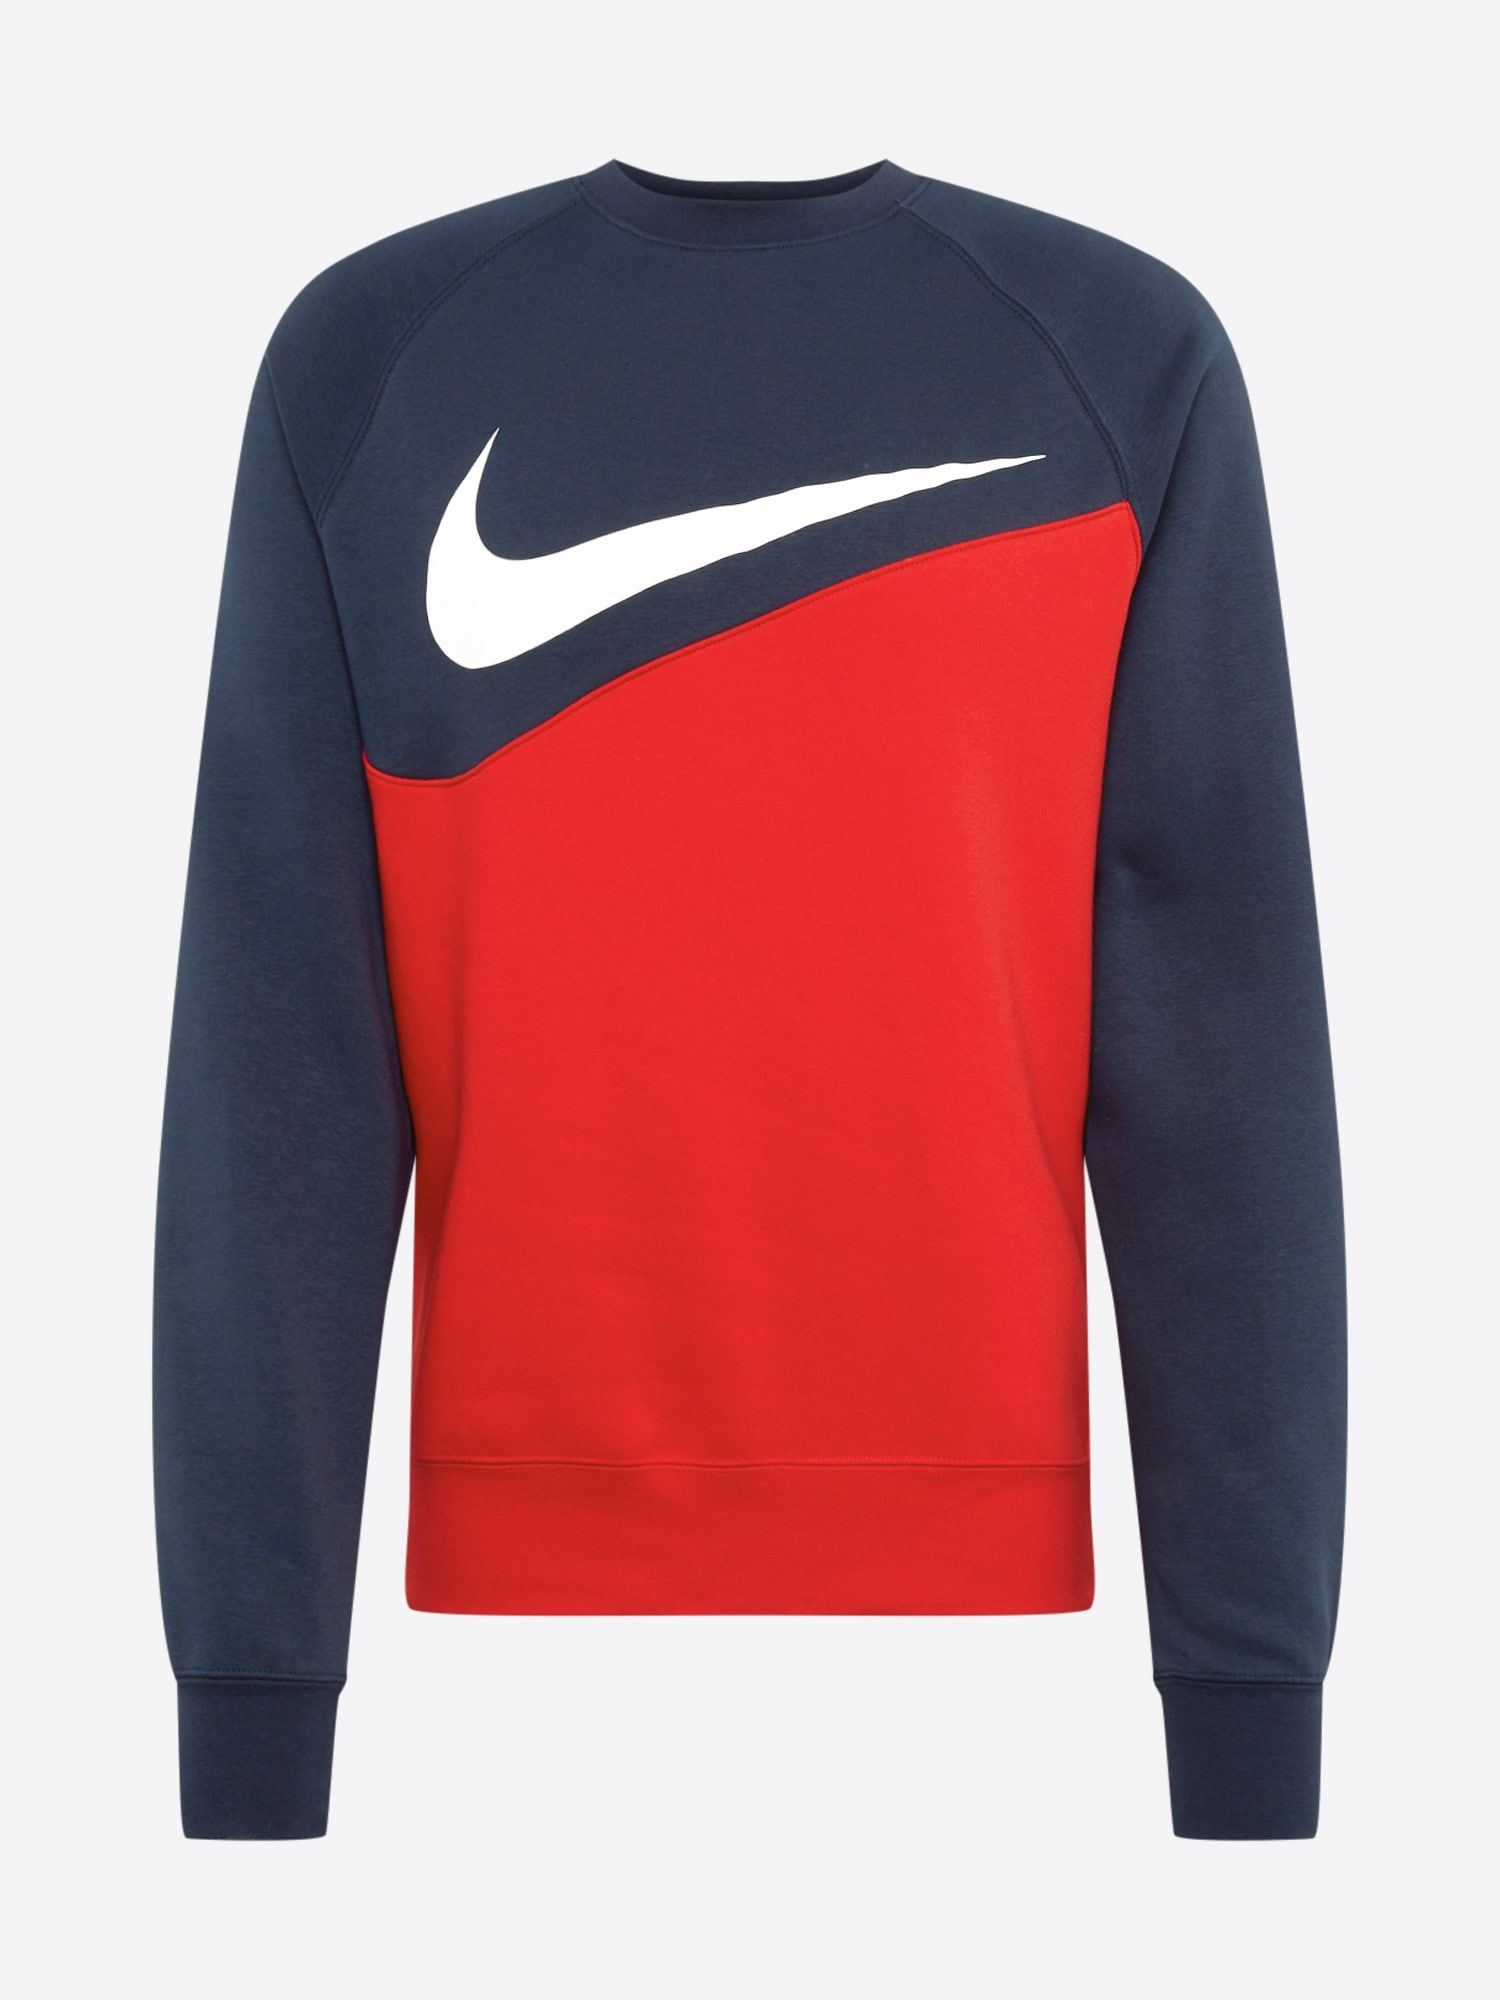 Nike Sportswear Sweatshirt 'SWOOSH' Herren, Navy Rot